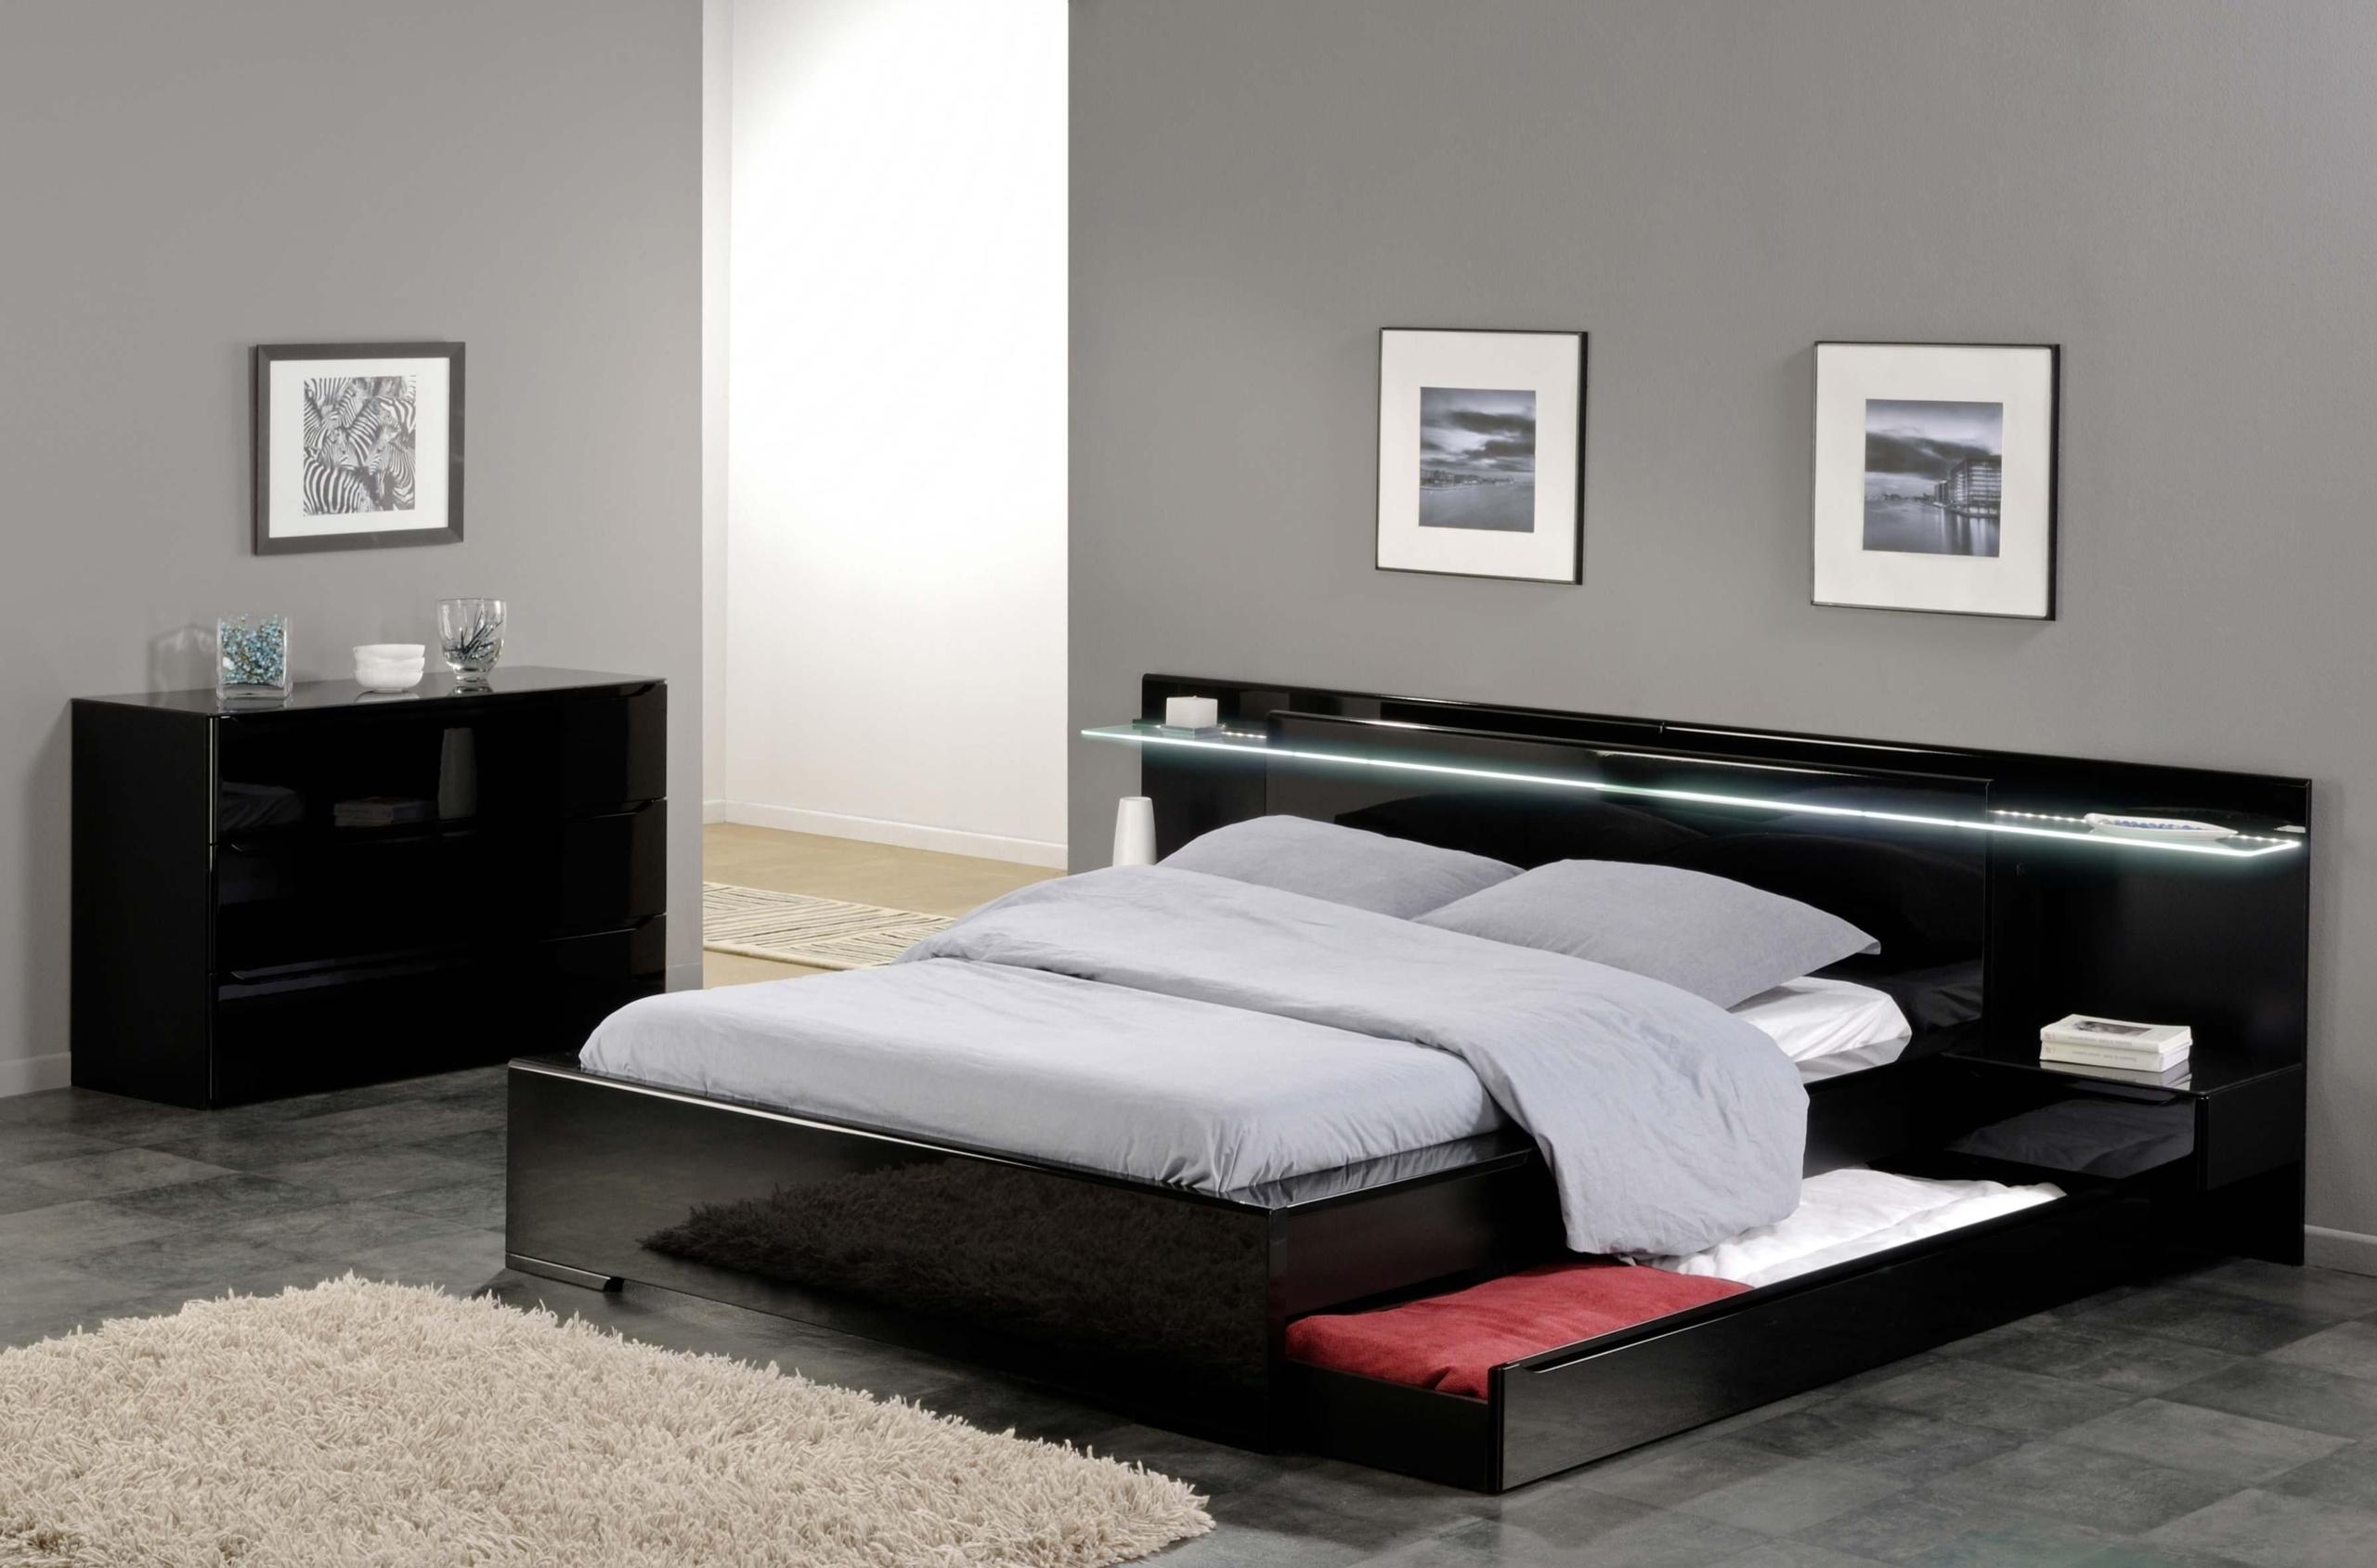 Charmant Savoy Black Gloss Headboard Light Storage Bed